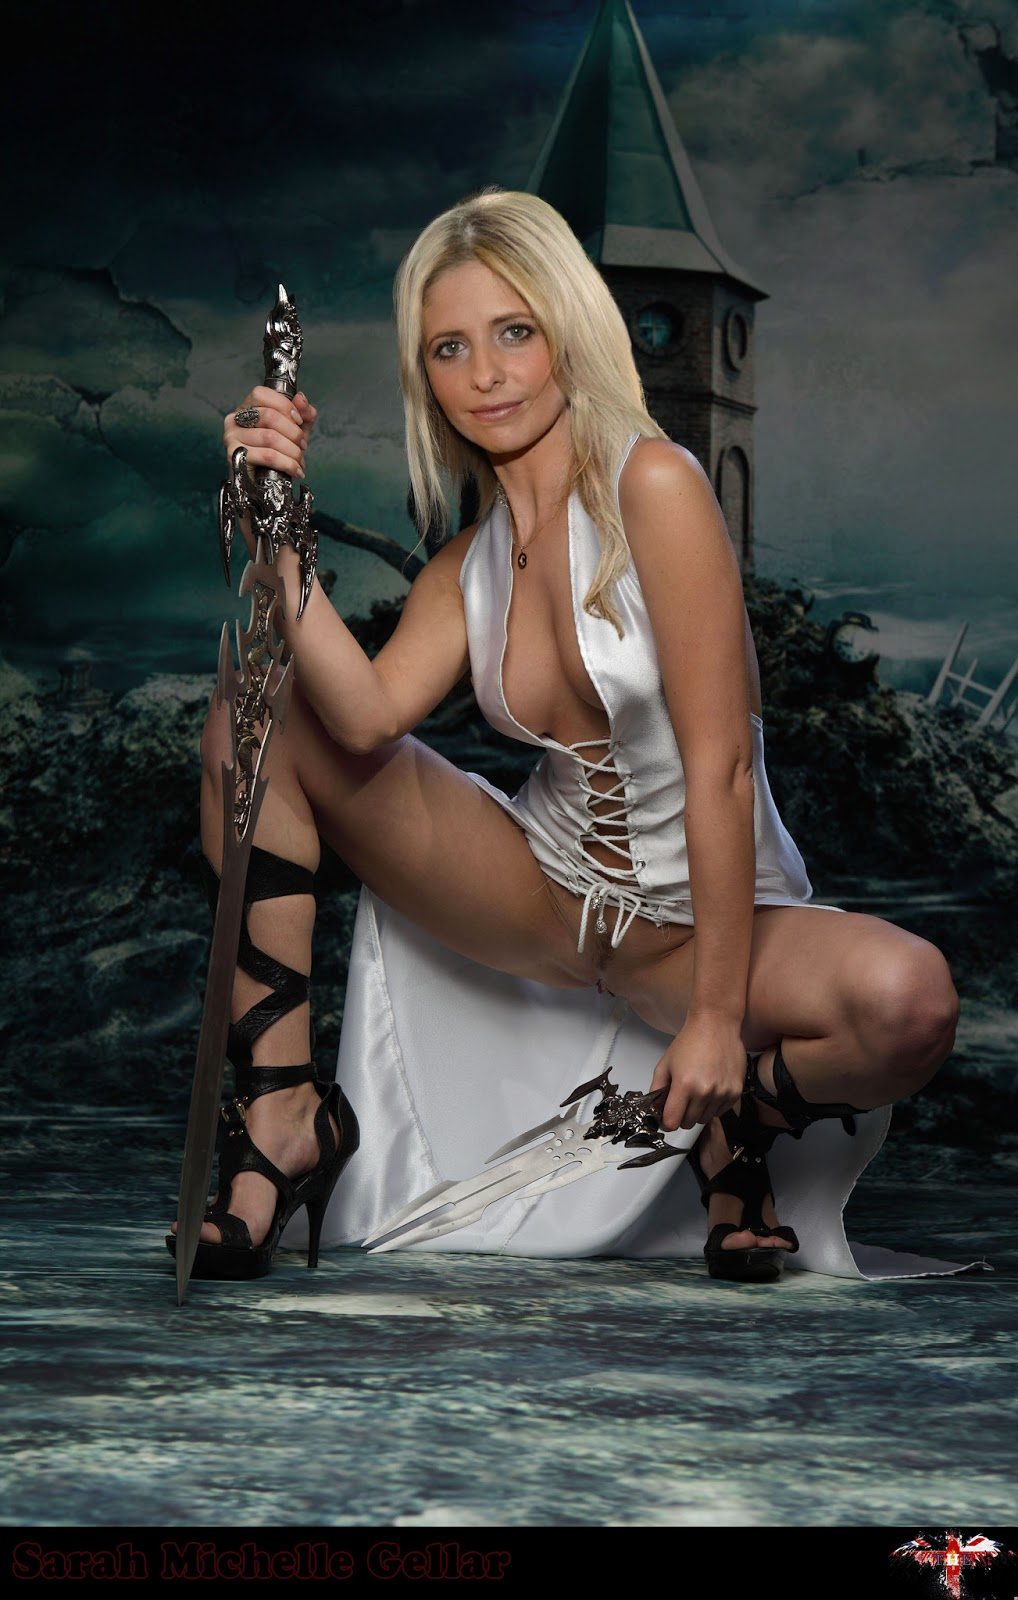 Sarah michelle gellar naked pictures